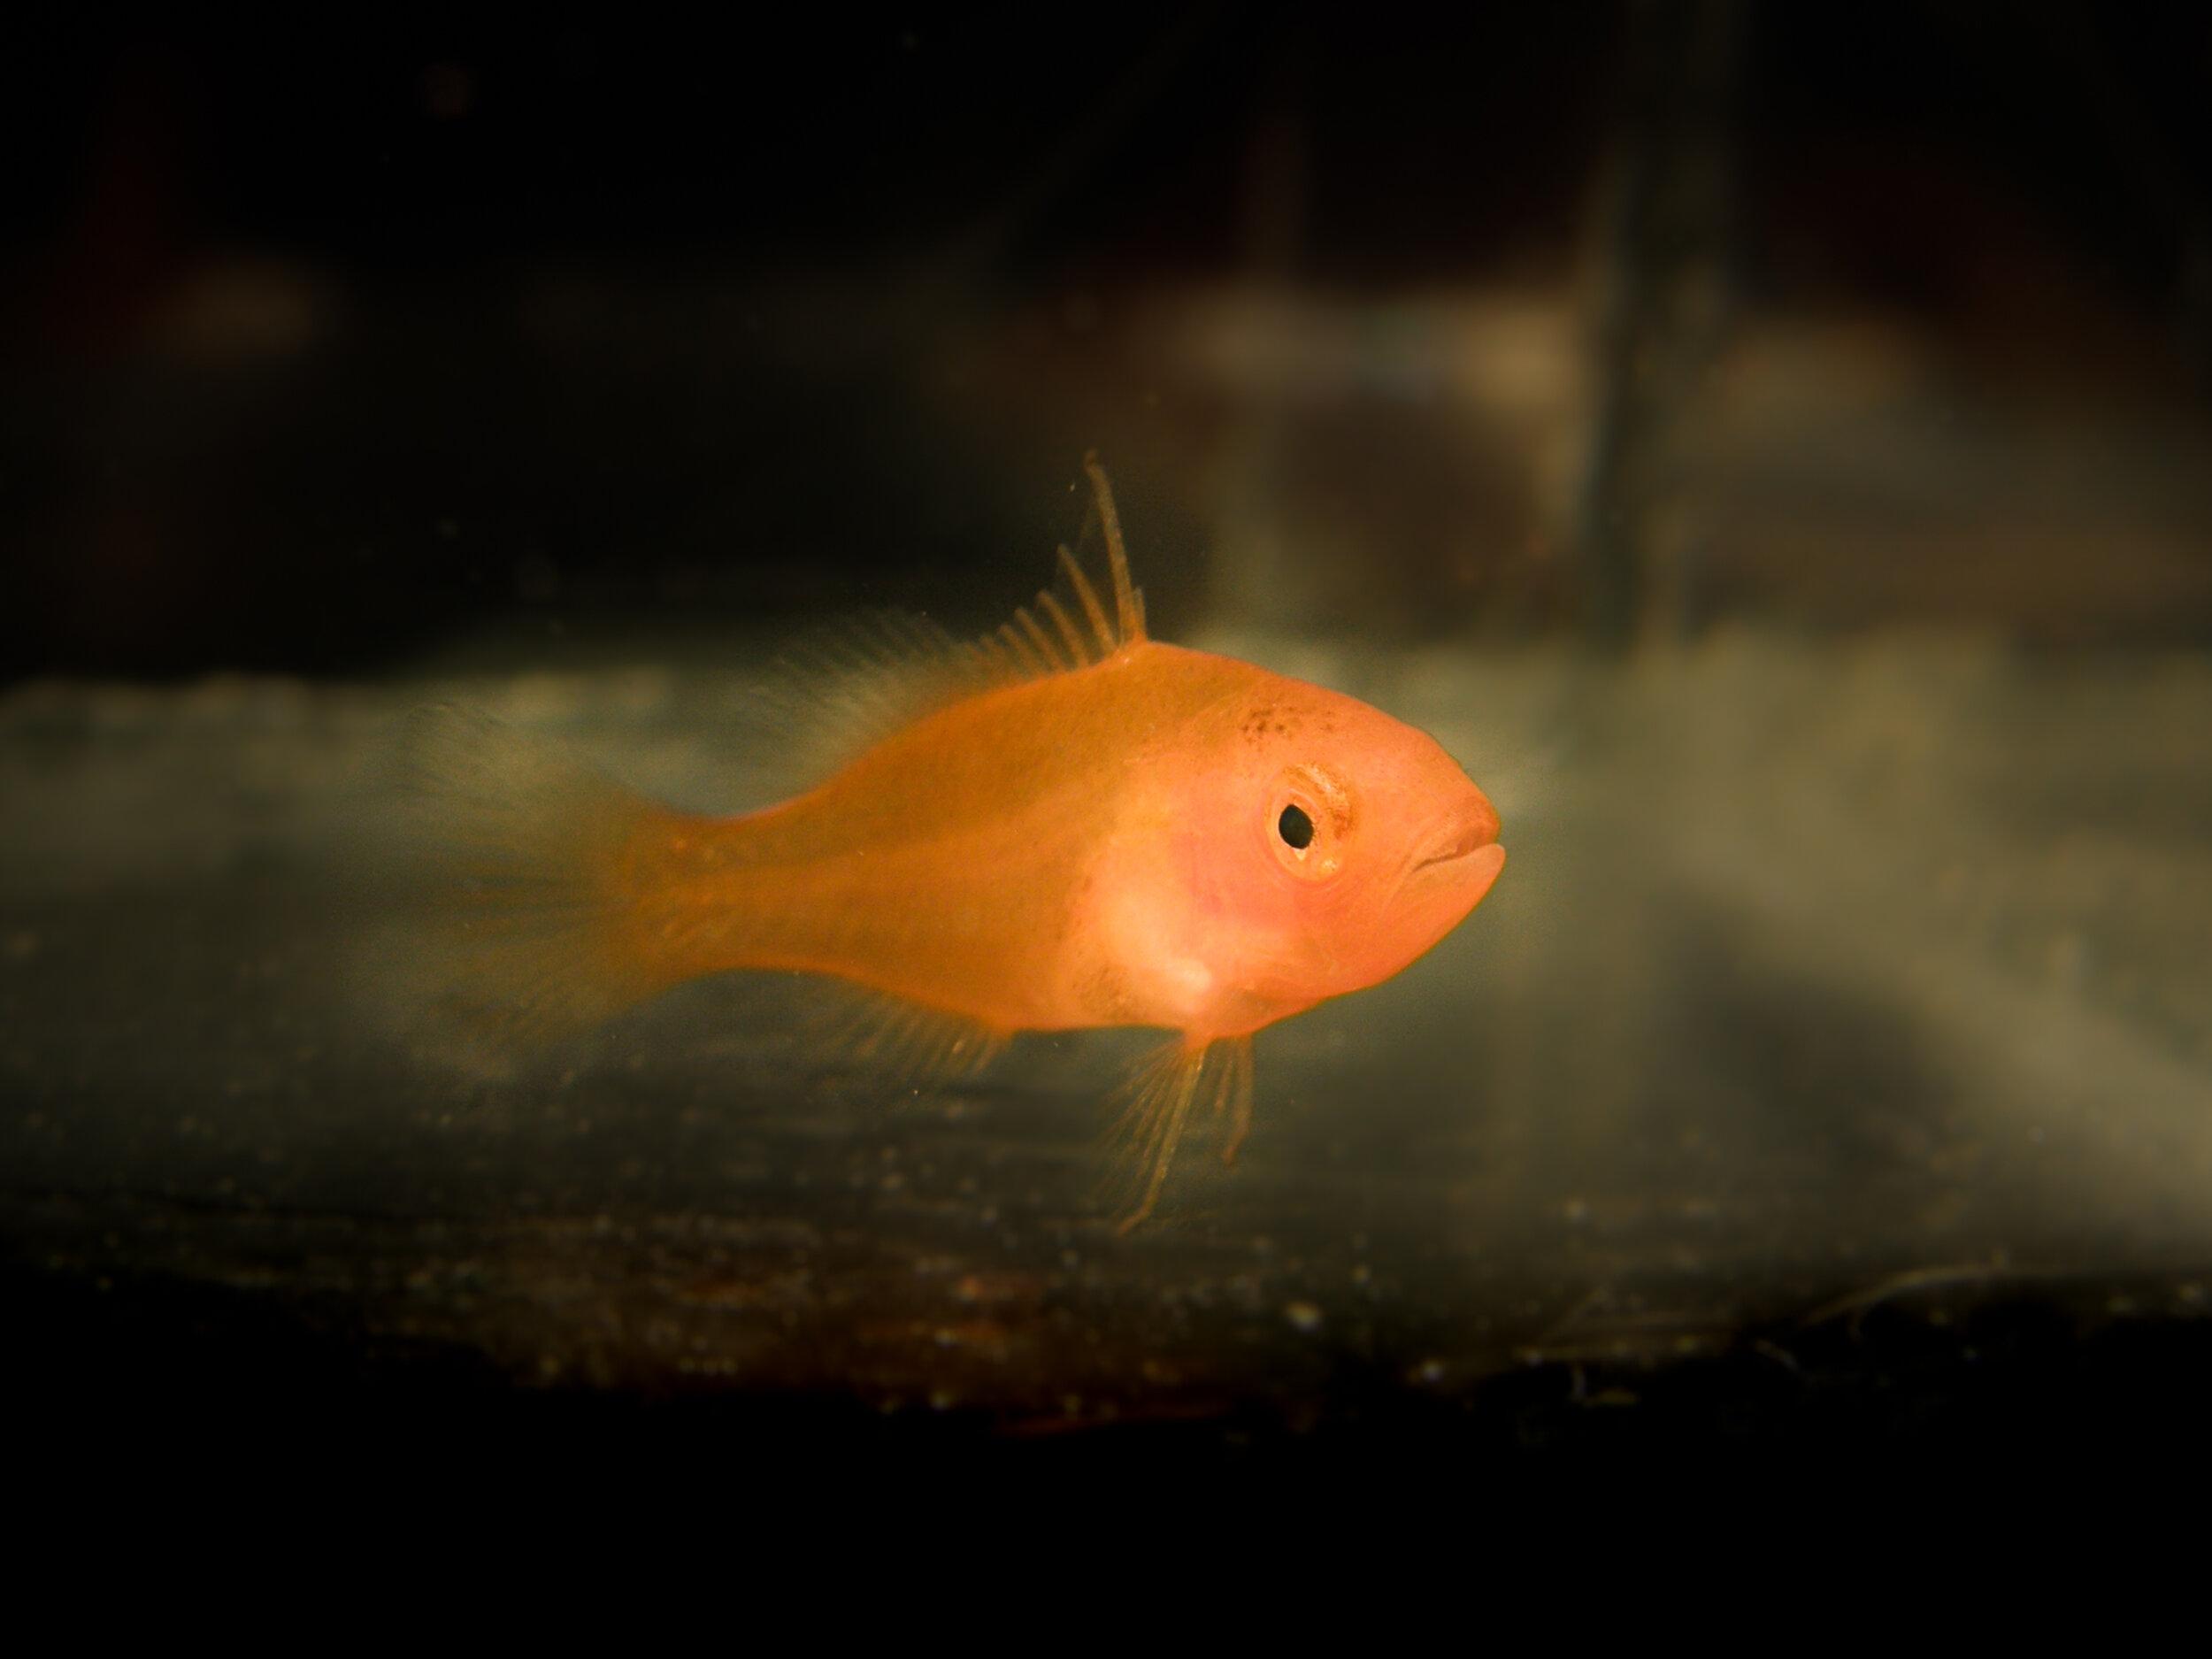 Pre-settlemnt coral trout larva. Credit: Colin Wen